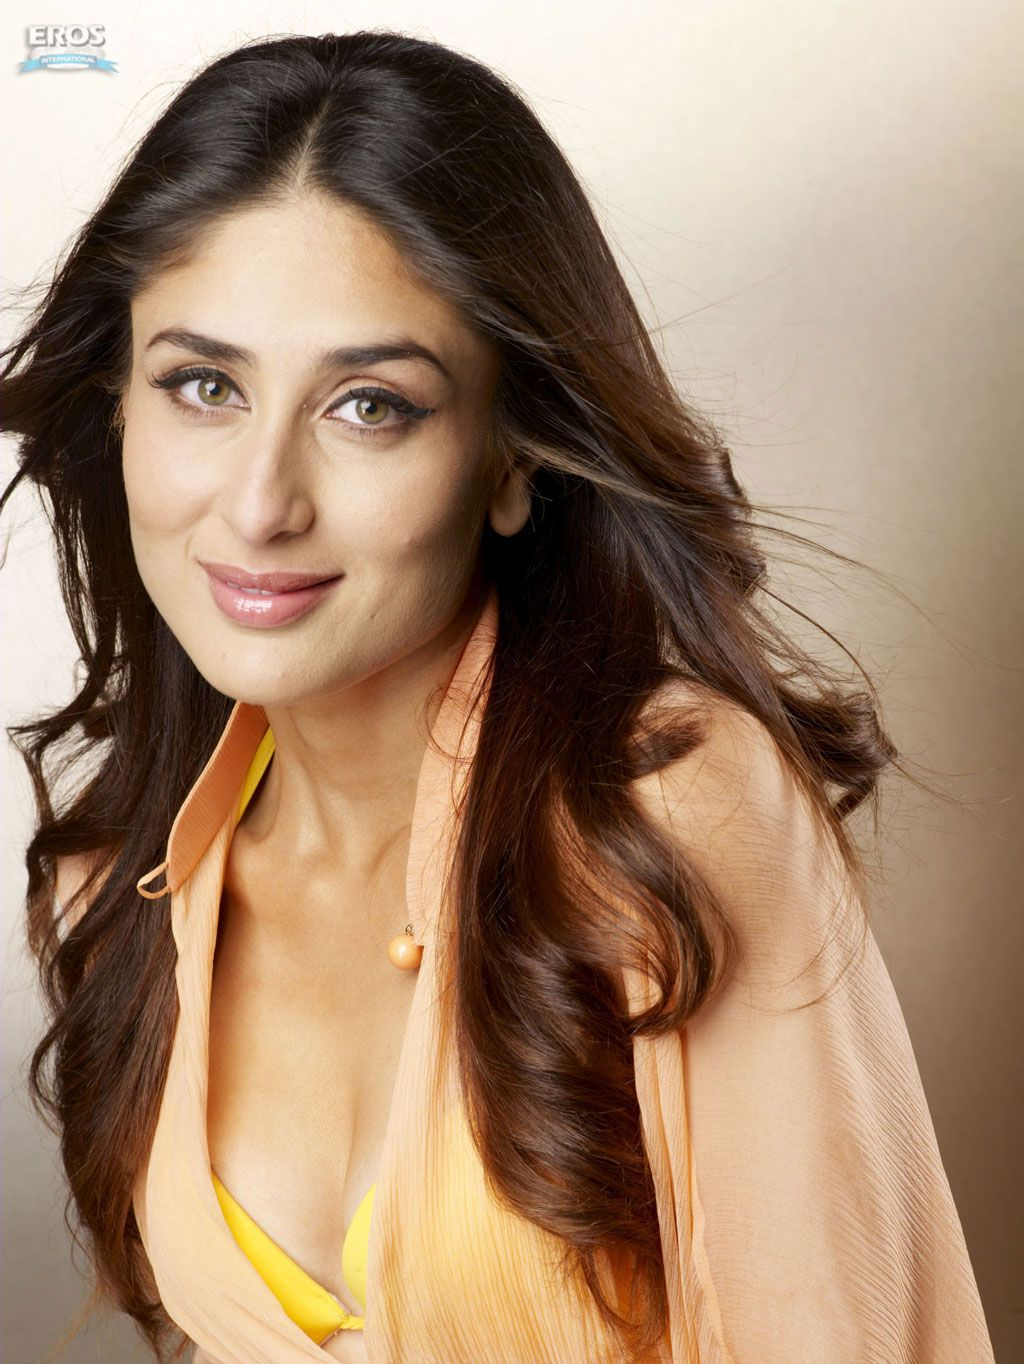 Image World Kareena Kapoor Beautiful  Hot Pictures And Wiki-7149